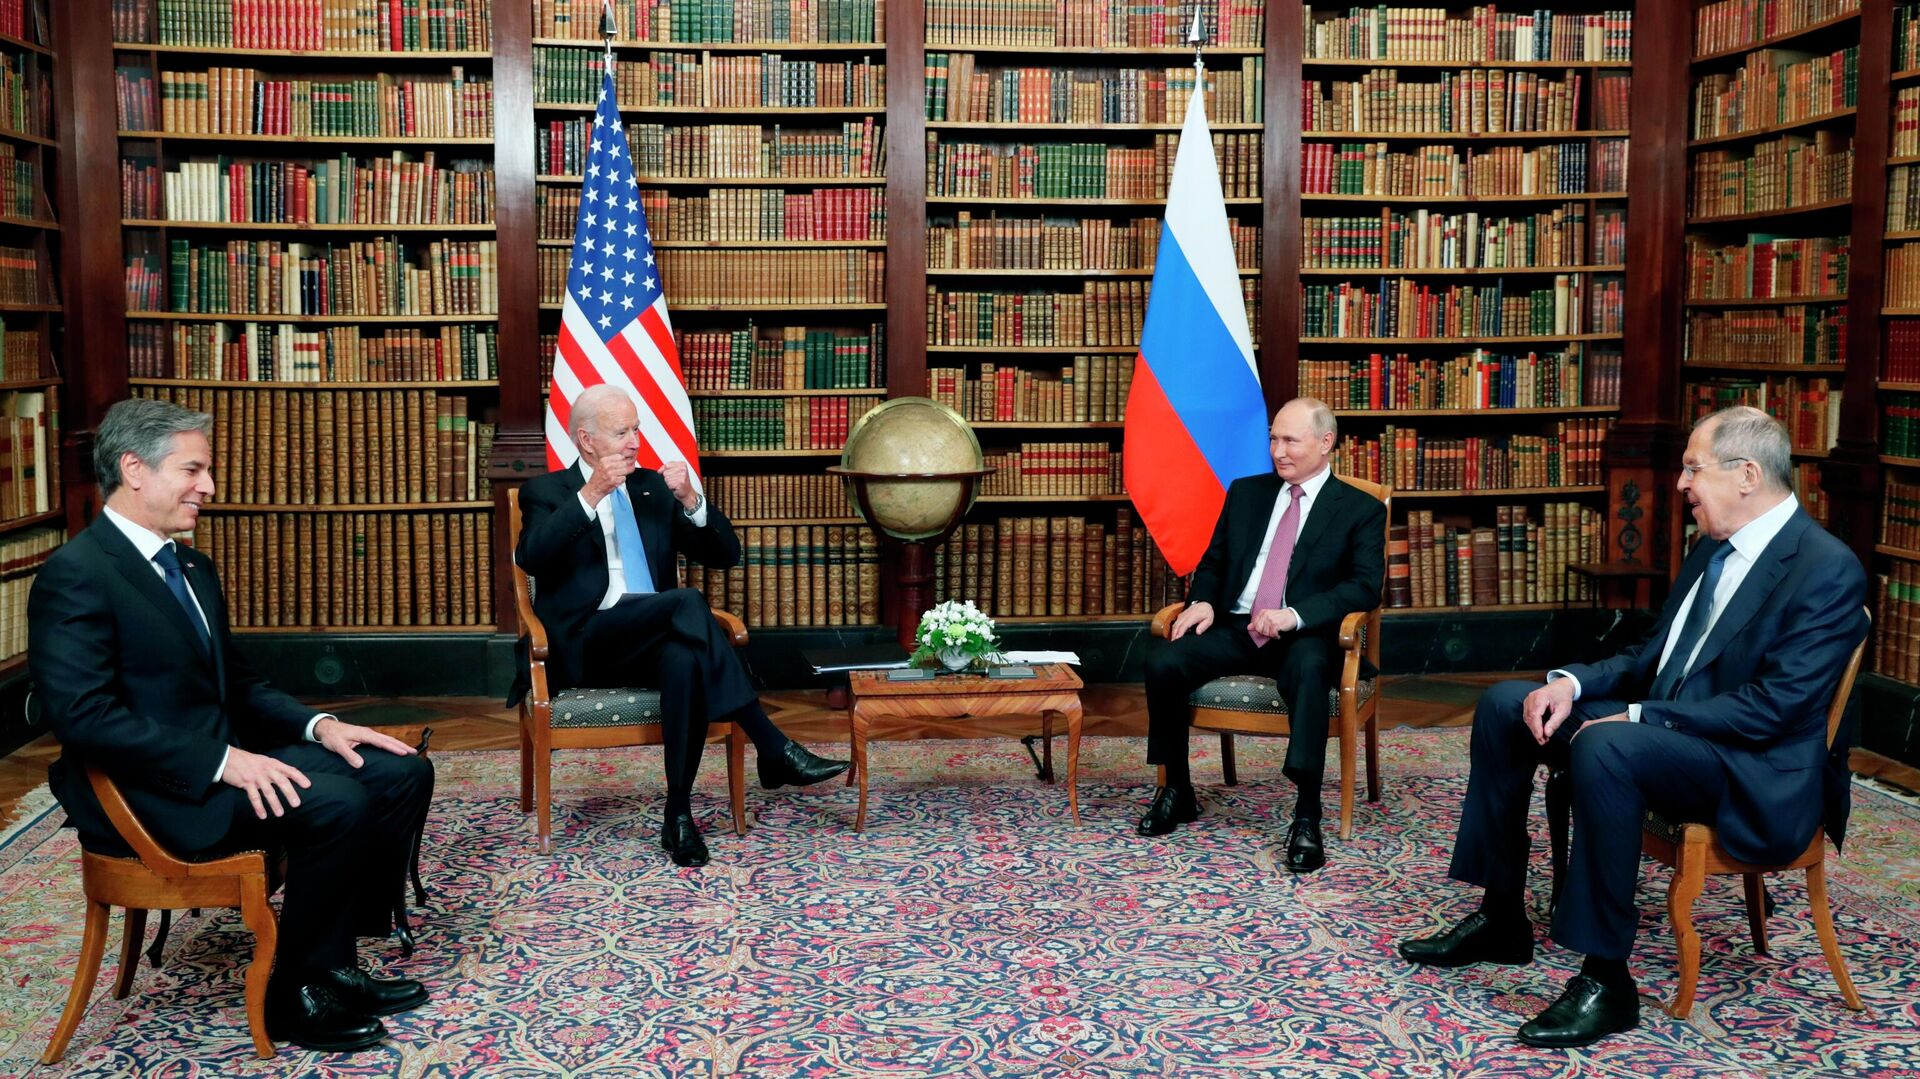 La cumbre entre Joe Biden y Vladímir Putin en Ginebra - Sputnik Mundo, 1920, 18.06.2021